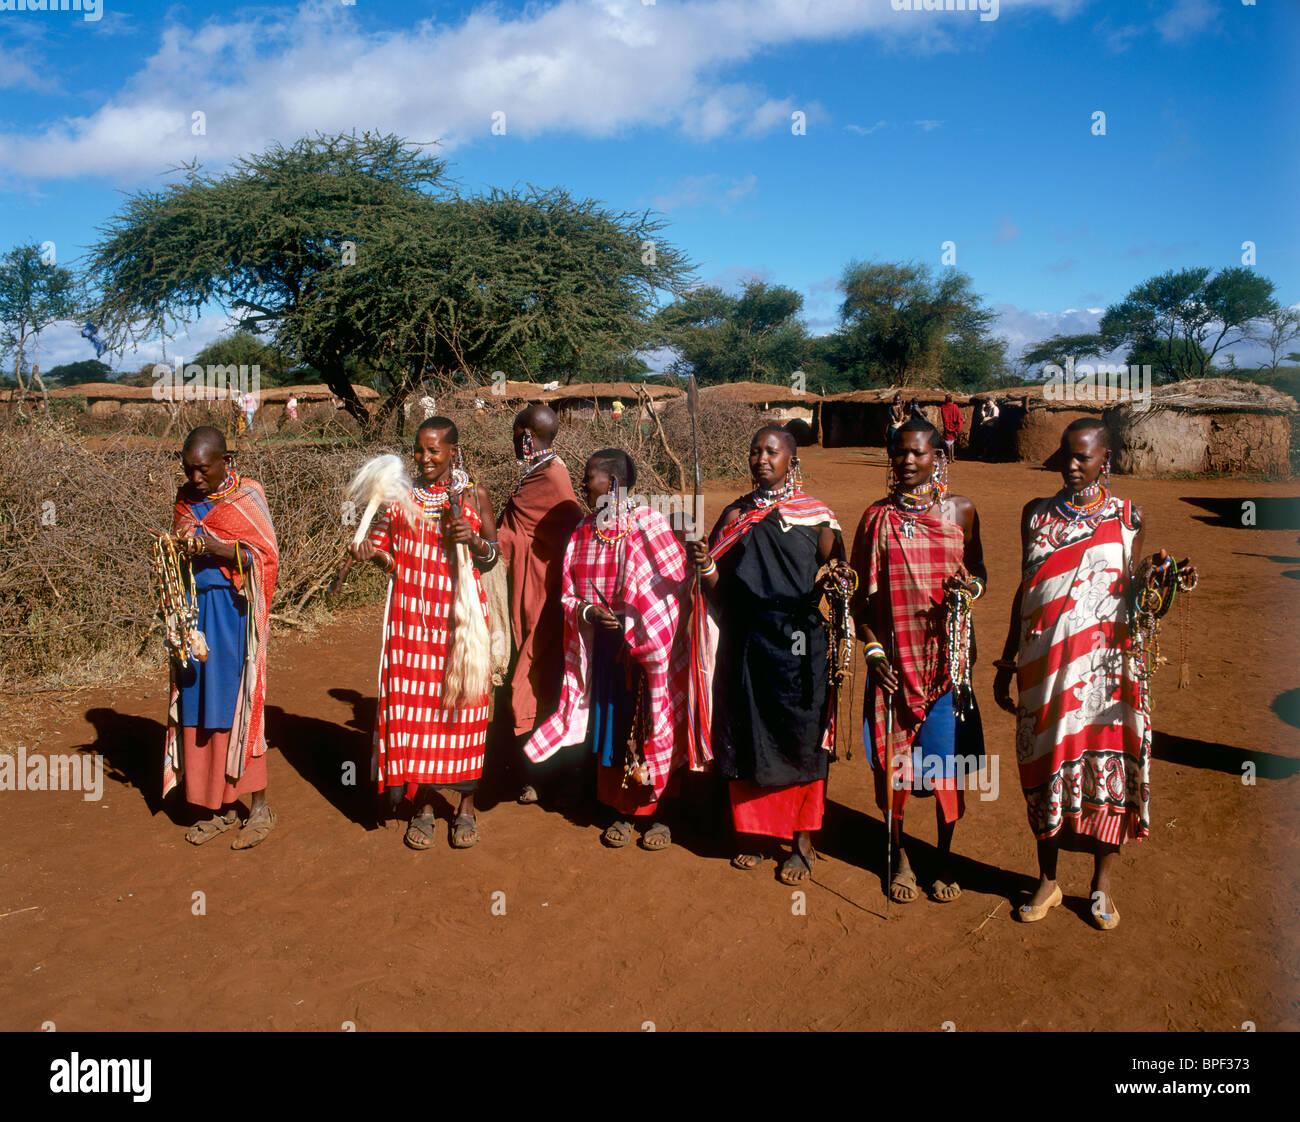 Masai tribeswomen, Parque Nacional de Amboseli, Kenia Imagen De Stock